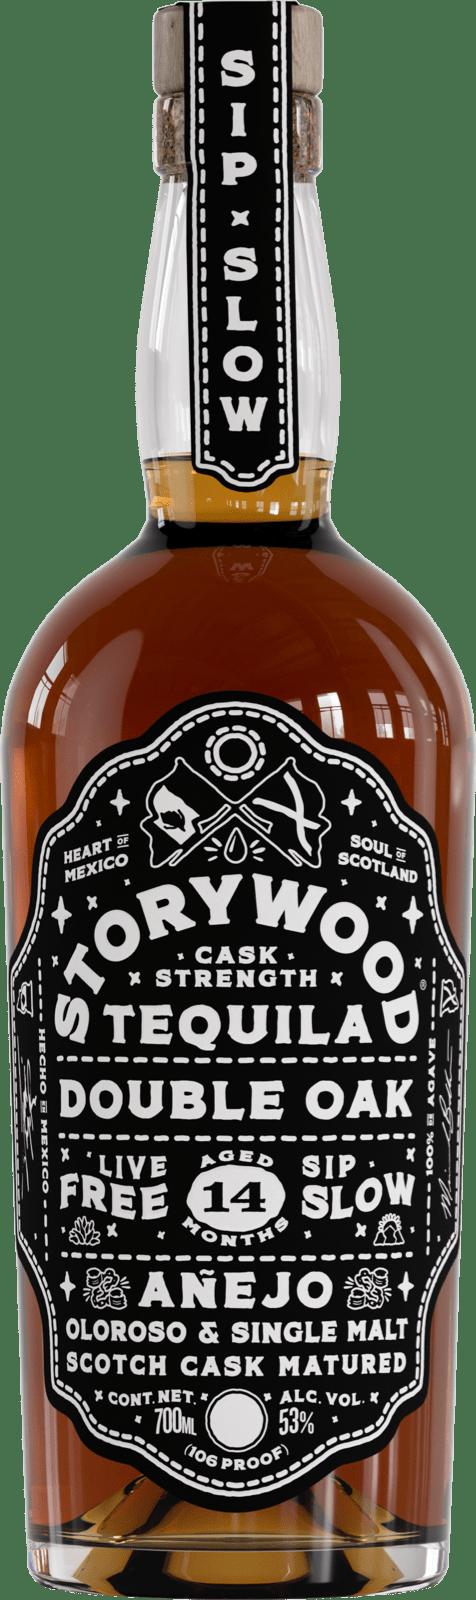 Storywood Double Oak anejo tequila